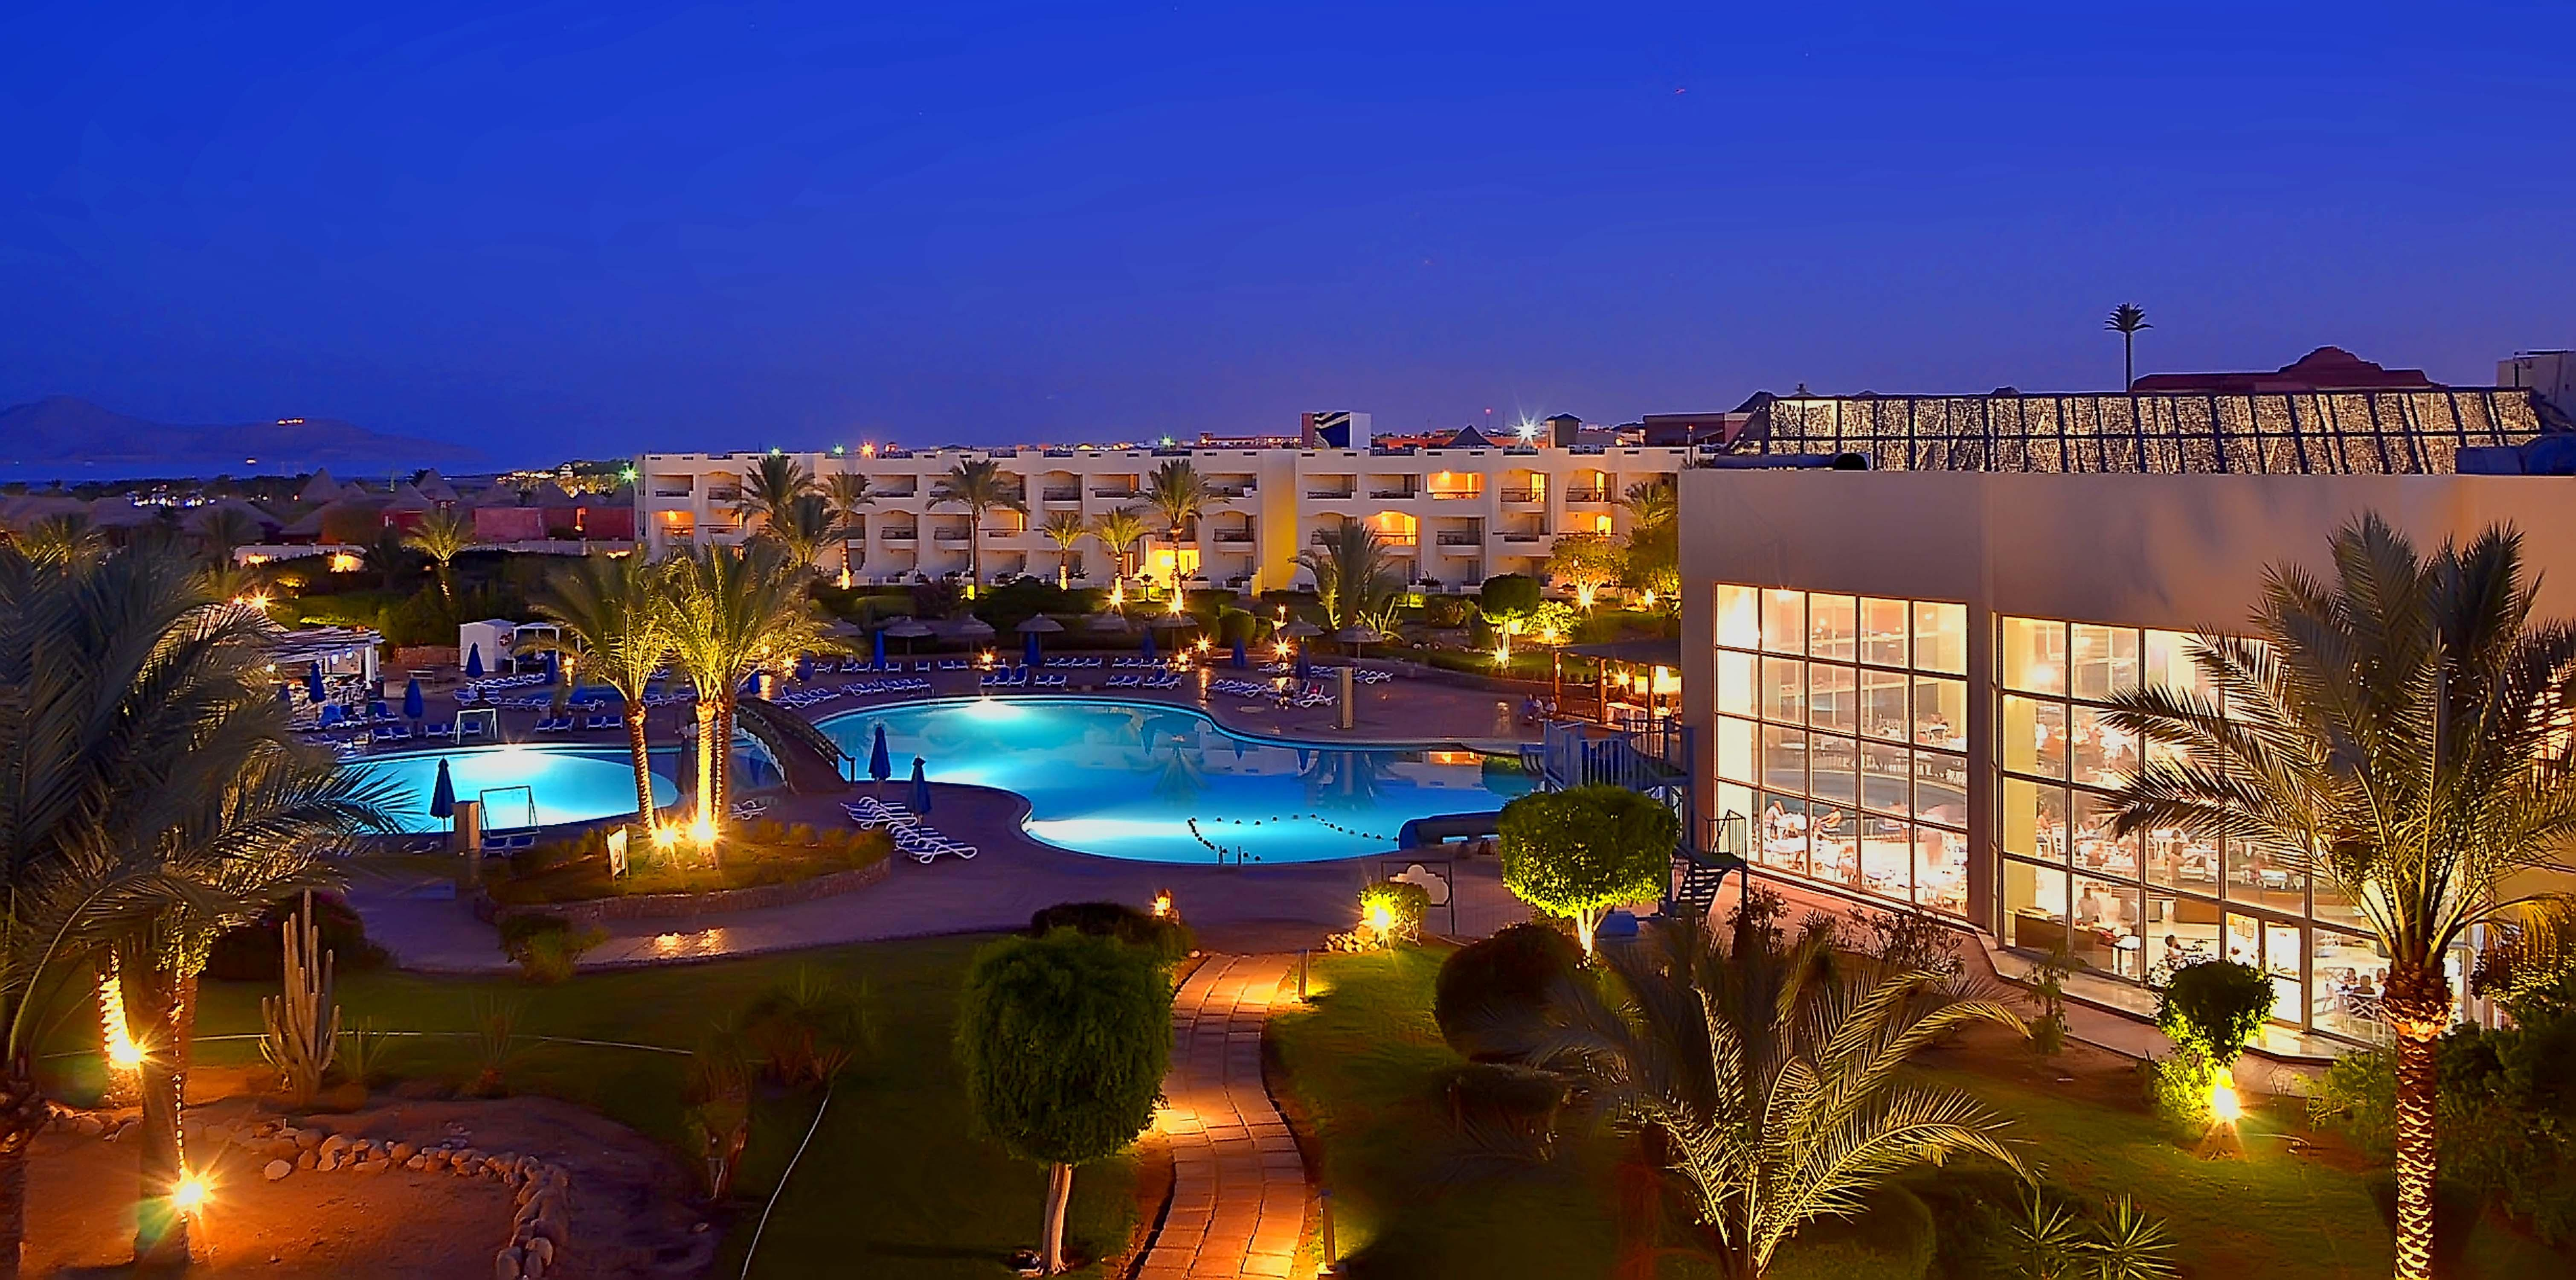 Oriental Resort Sharm El Sheikh